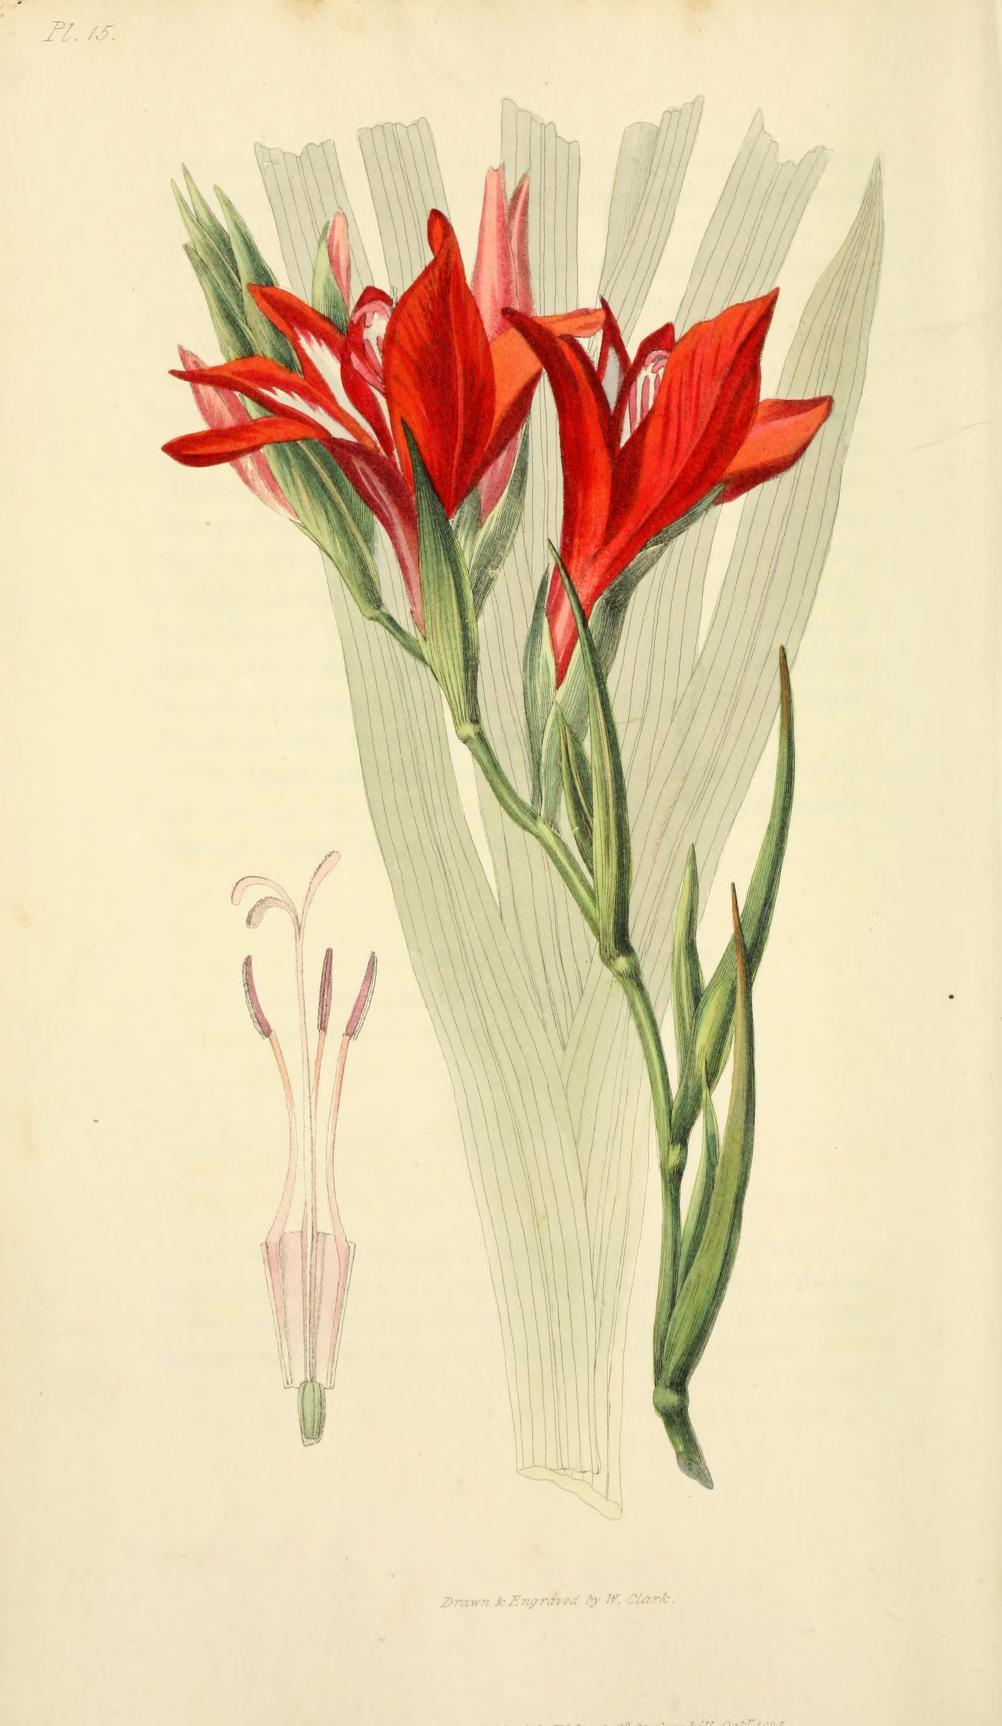 Gladiolus. Page 72.